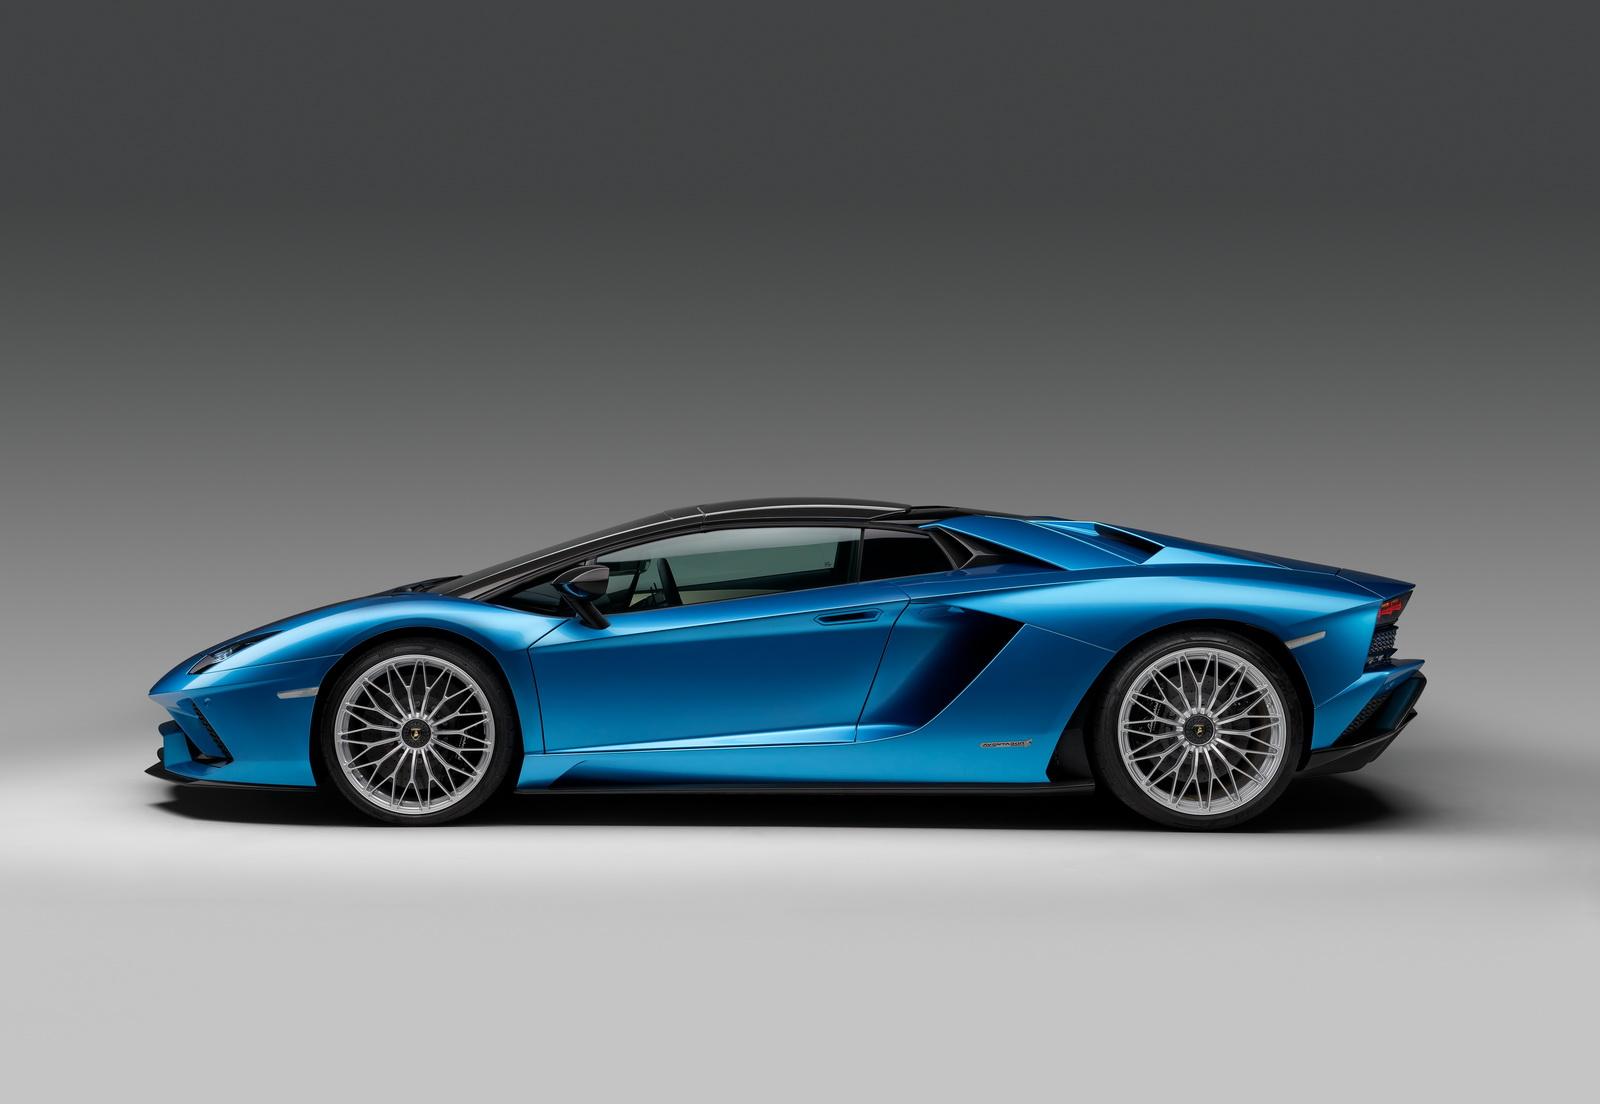 2018_Lamborghini_Aventador_S_Roadster_04